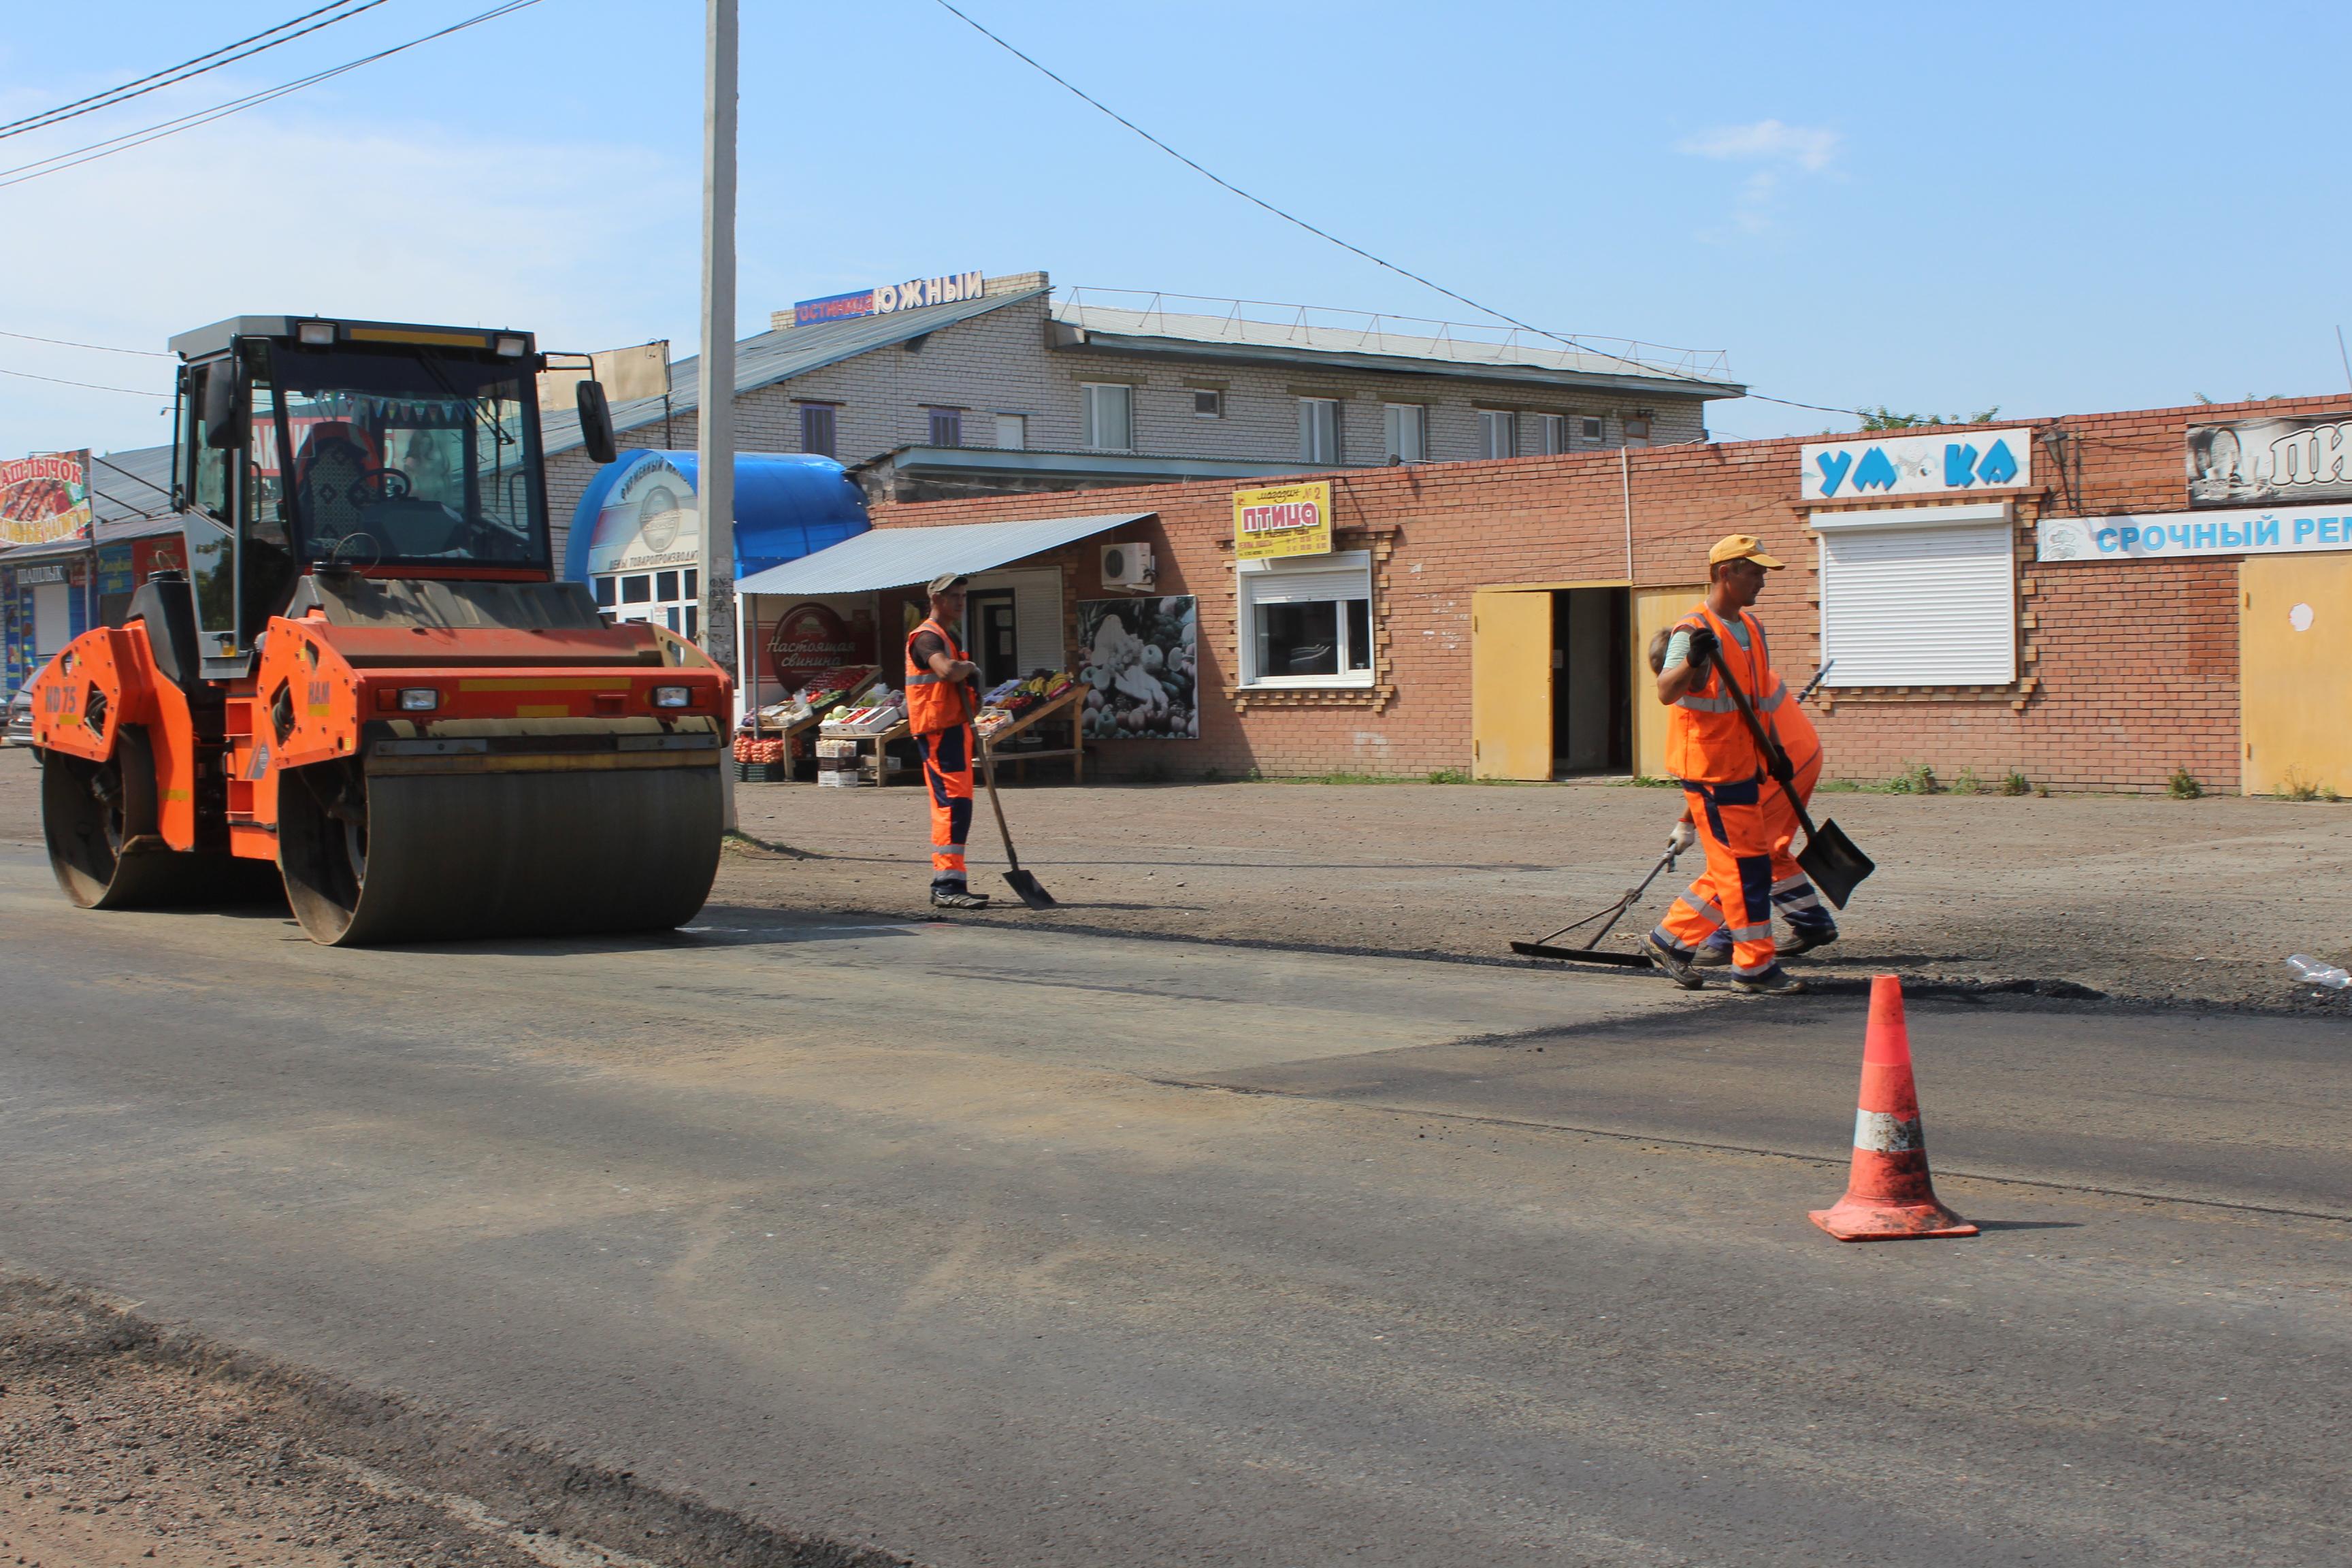 Ремонт дорог в разгаре: работа «кипит»